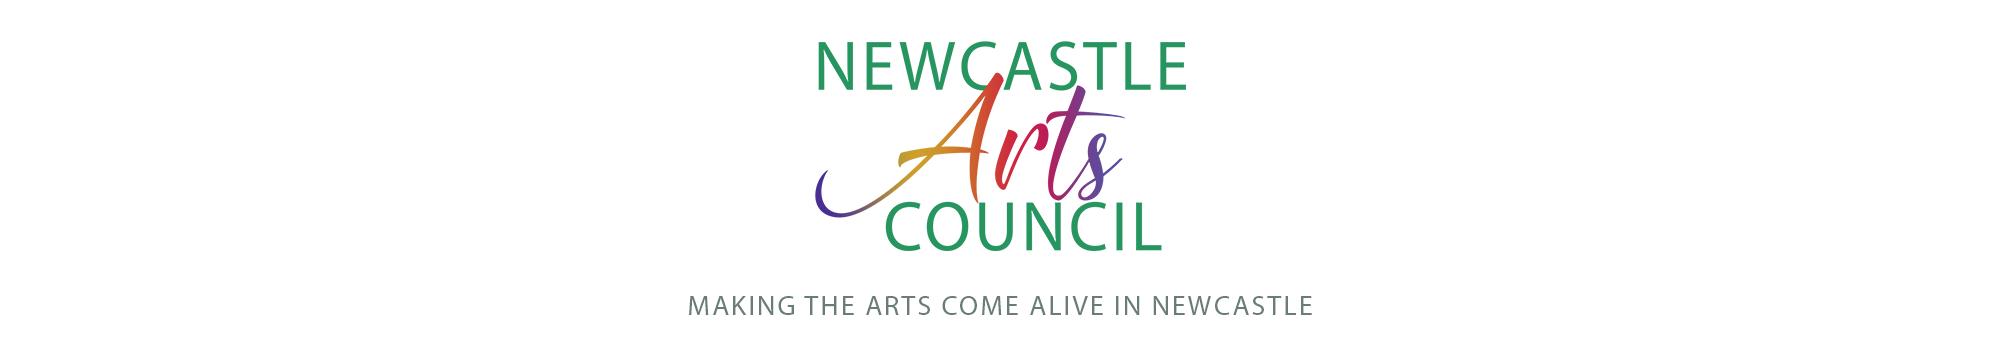 Newcastle Arts Council